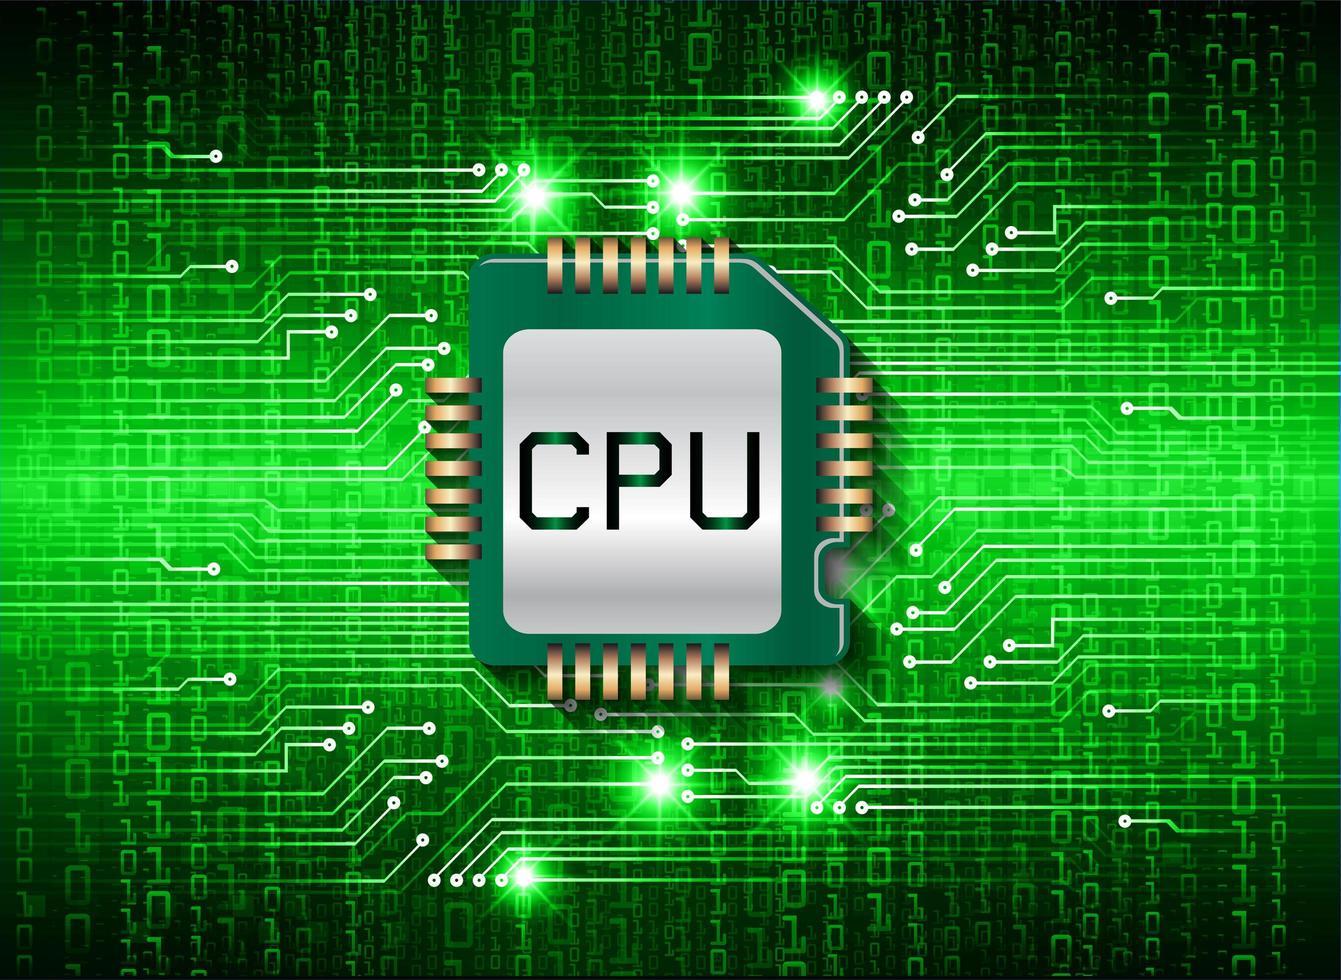 groene cpu cyber circuit toekomstige technologie concept achtergrond vector